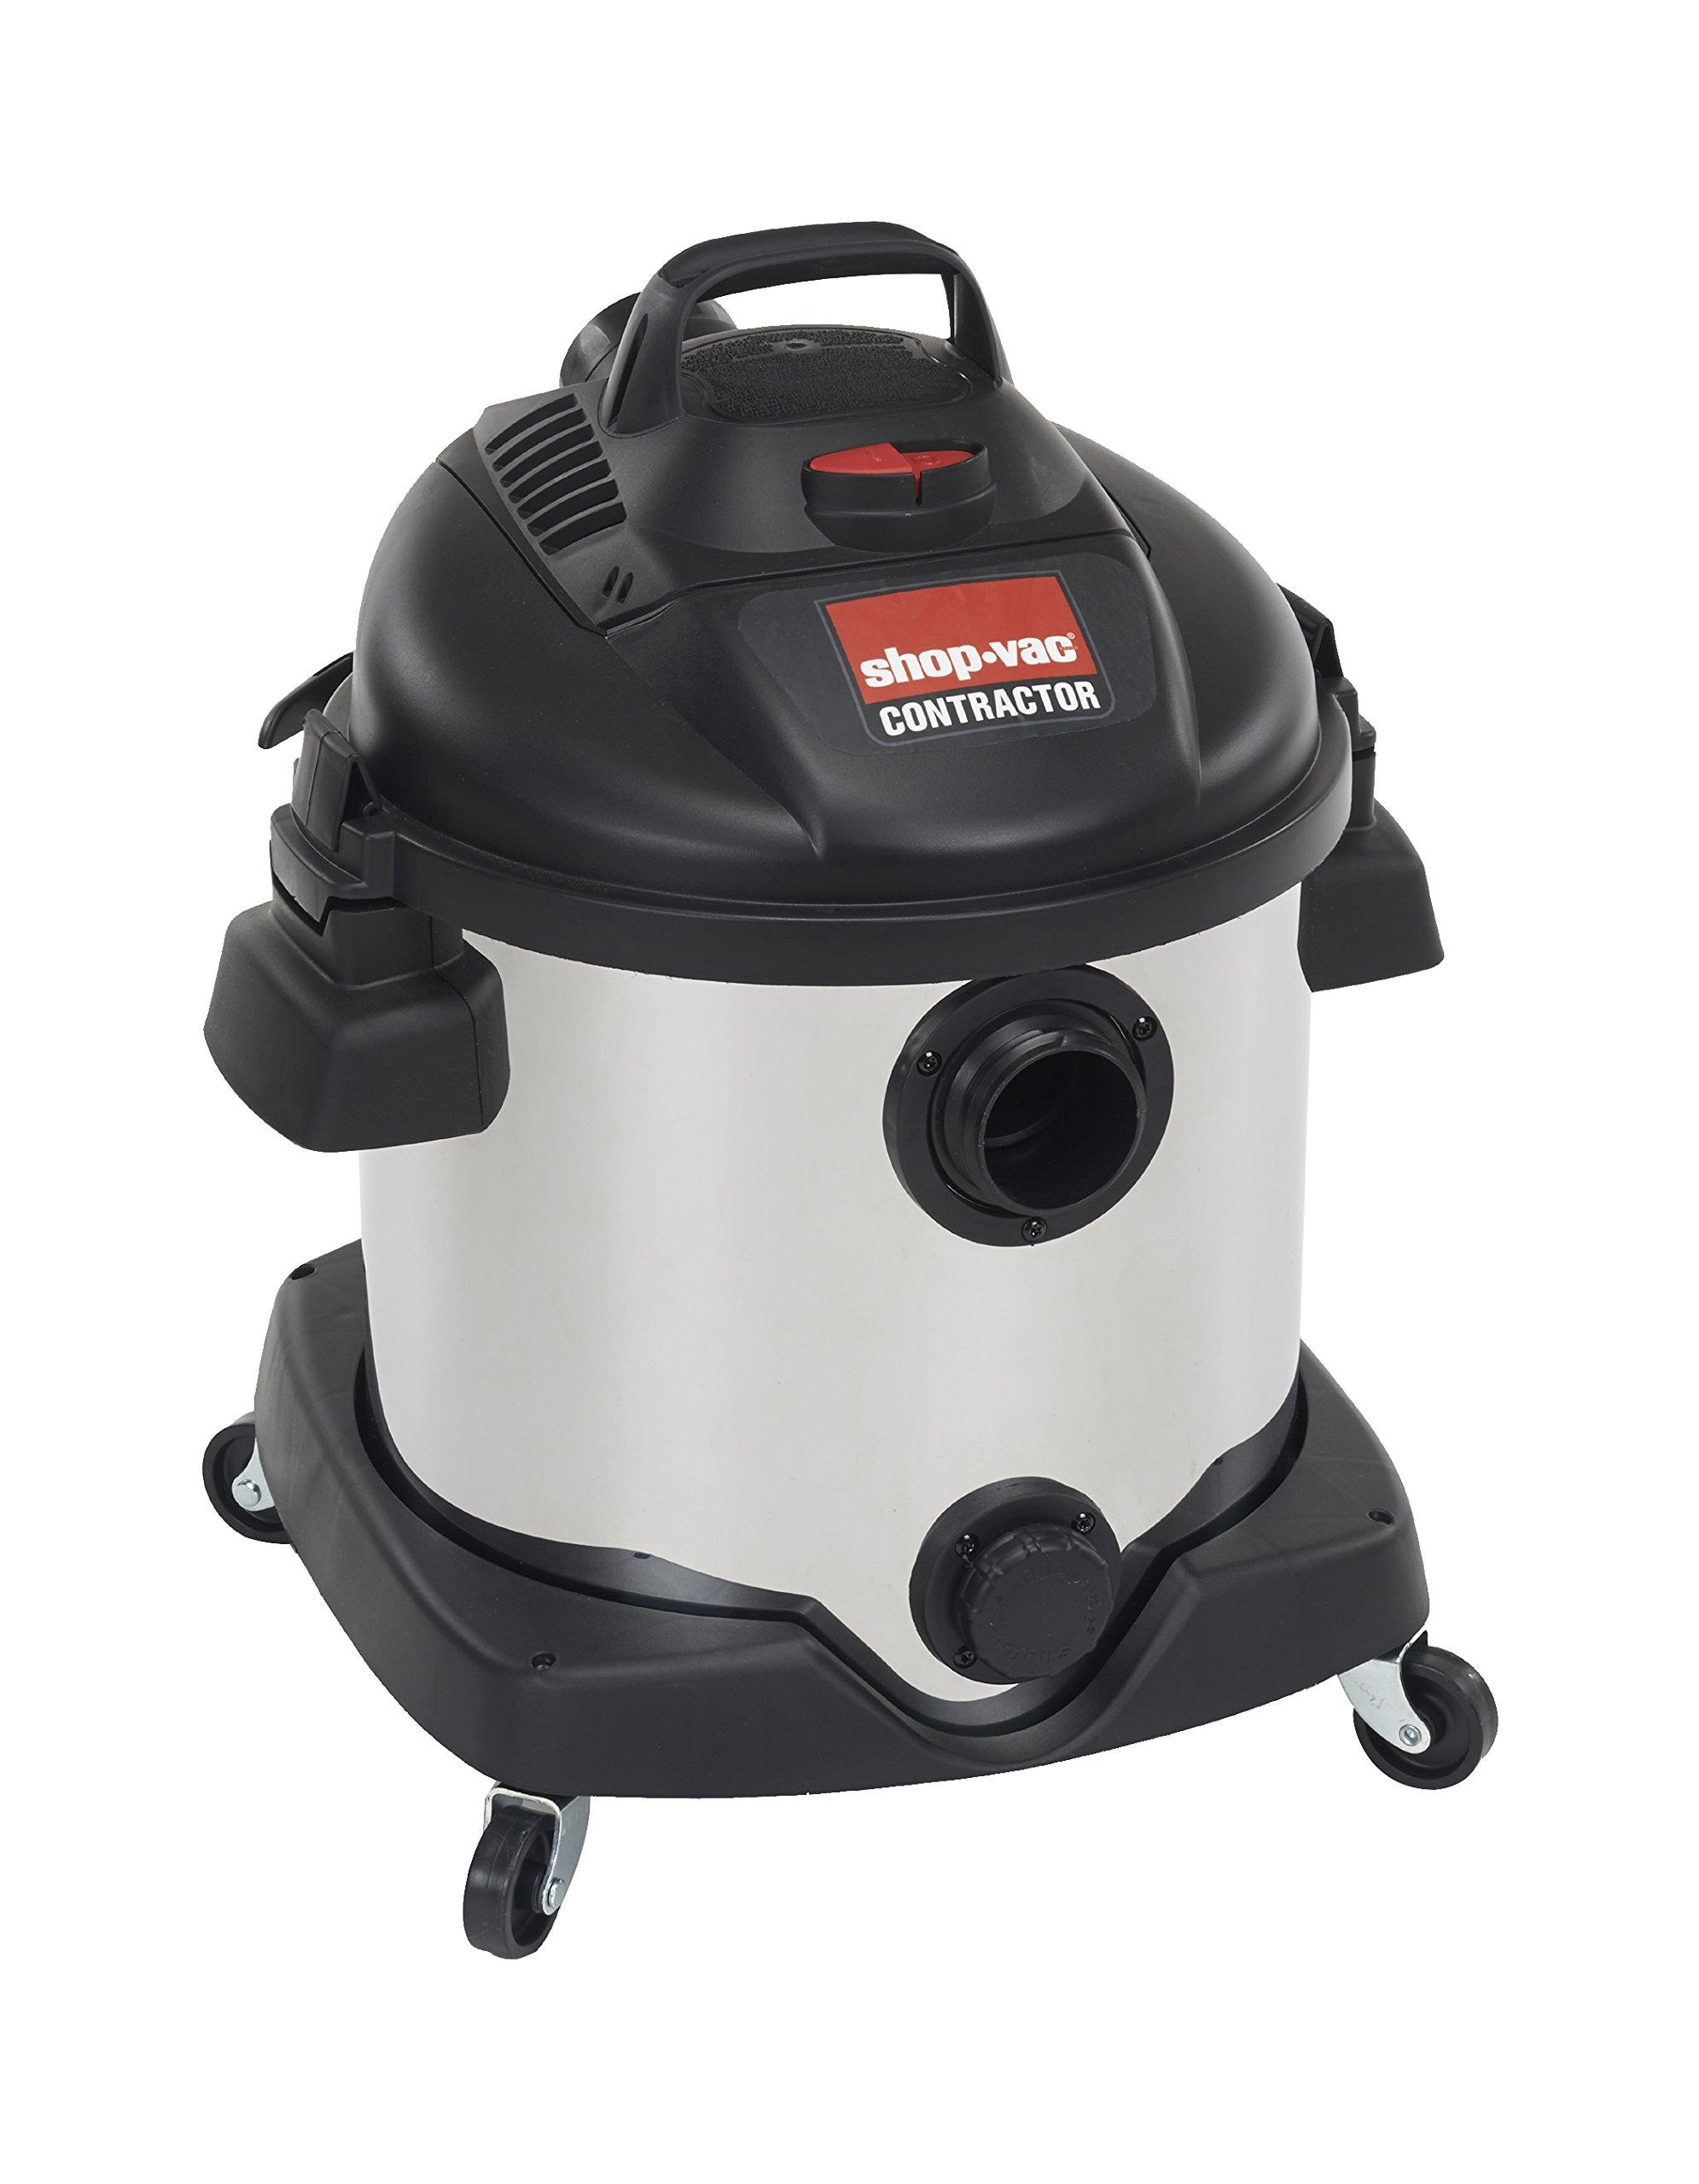 Shop-Vac 5875110 5.5 Peak HP Wet Dry Vacuum, 8-Gallon